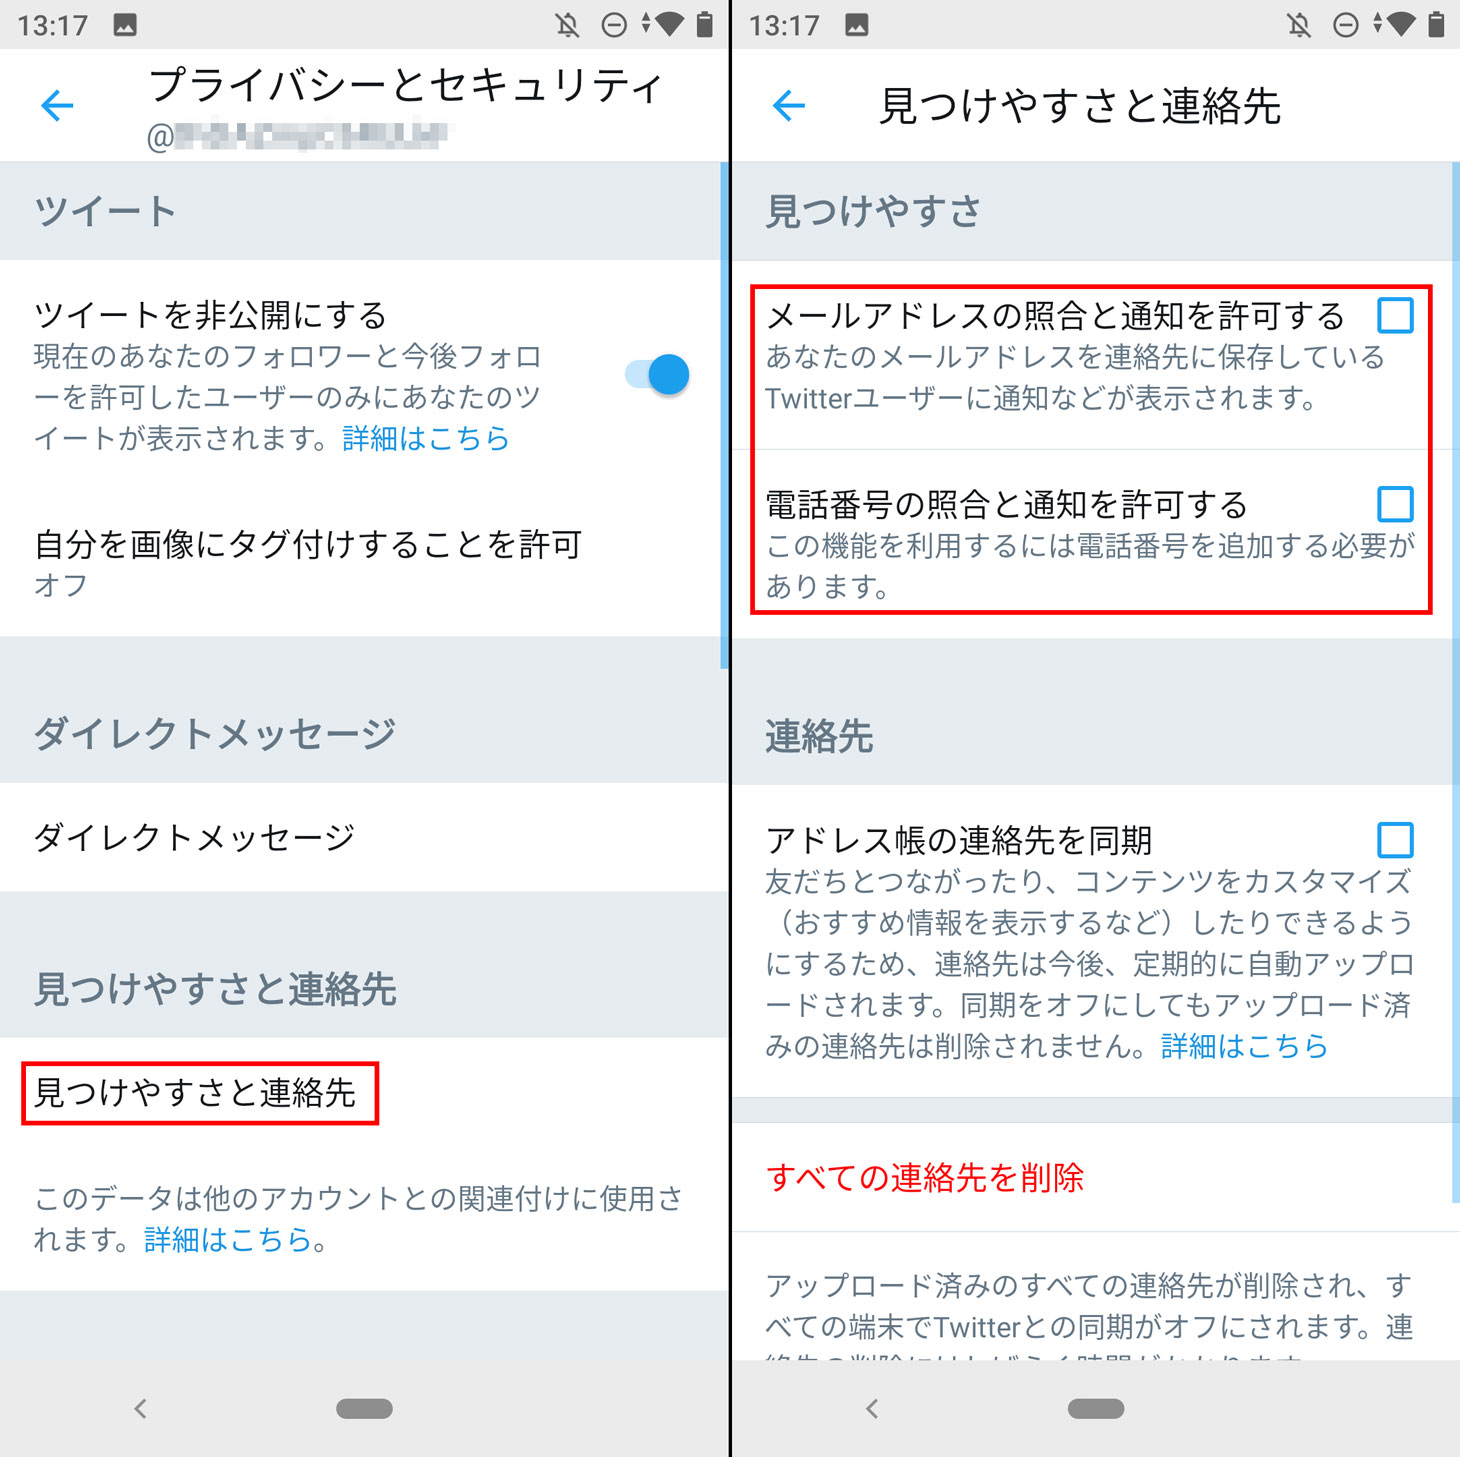 Twitterで他の利用者に電話番号やメールアドレスで検索されないようにする方法